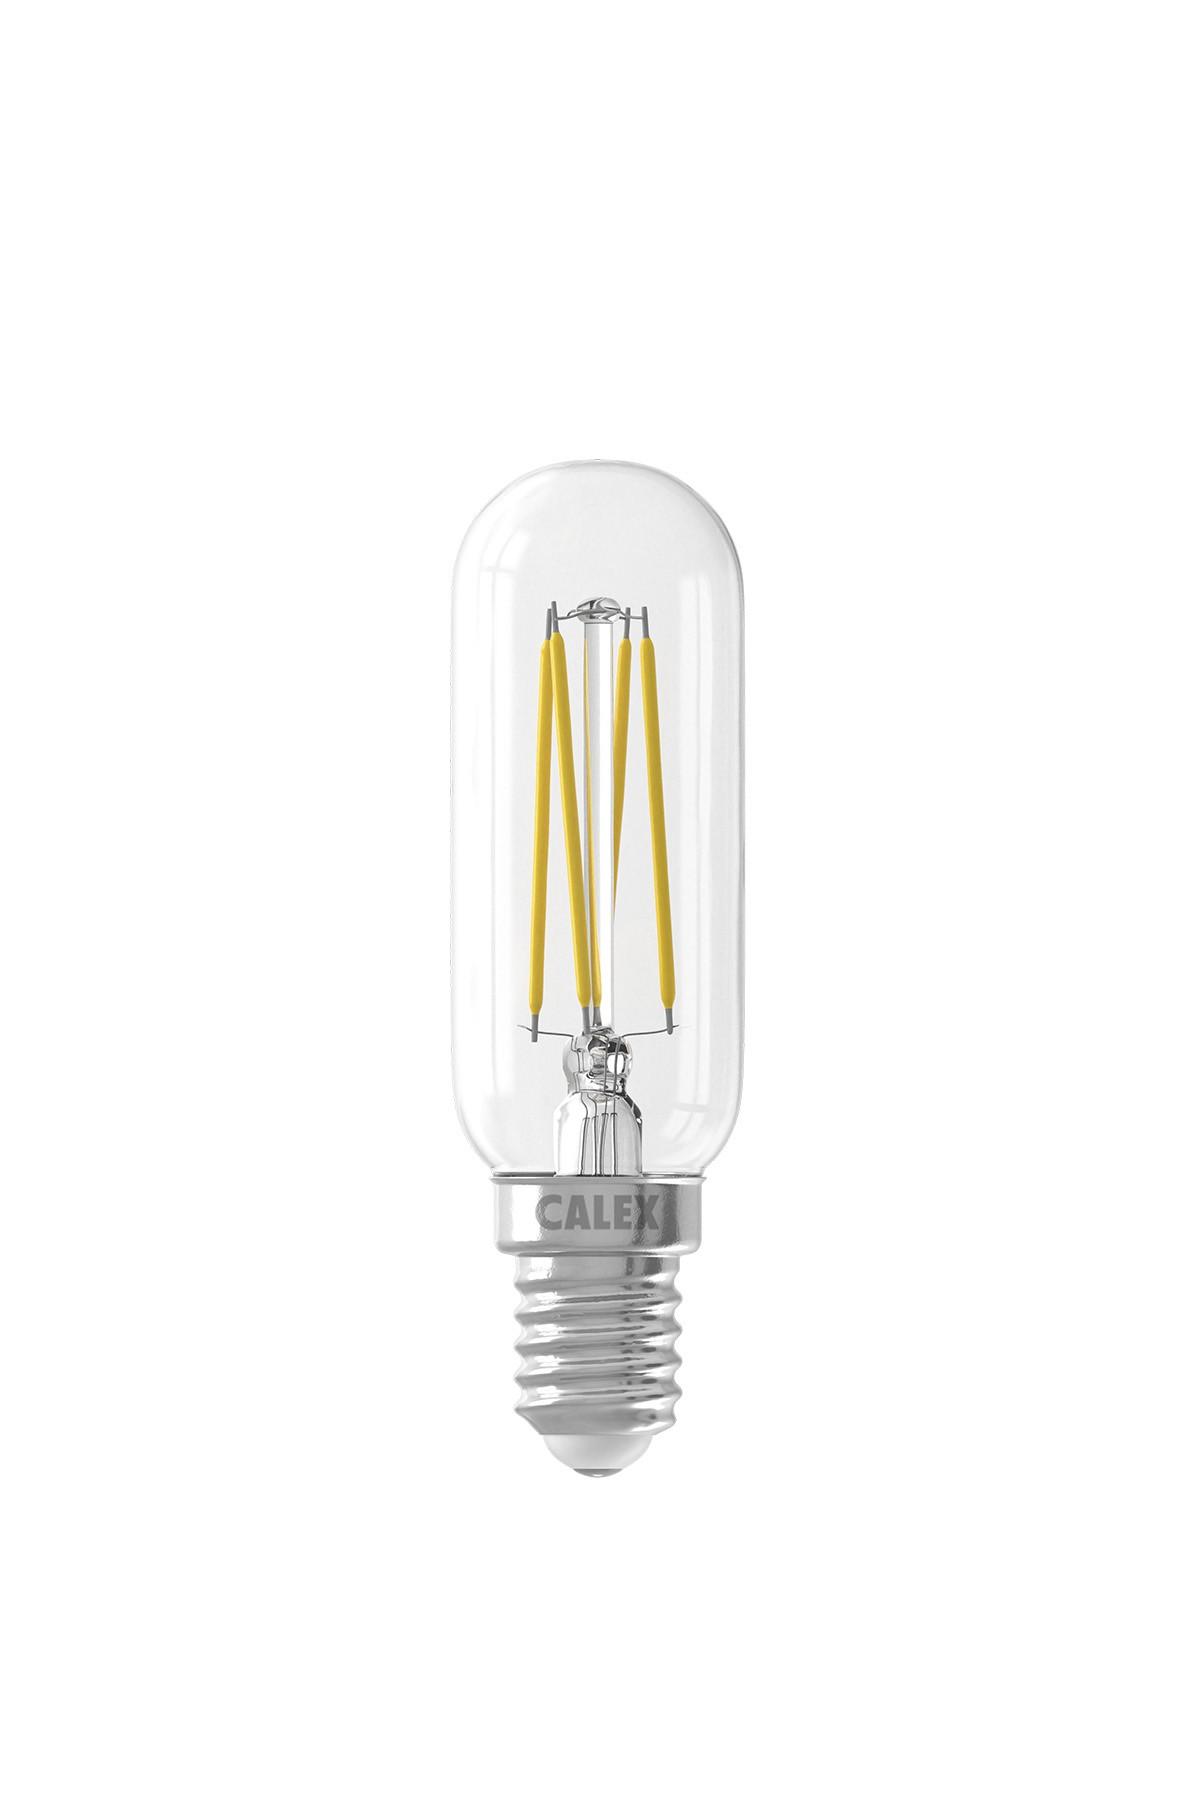 Dimbare Filament LED Tube Lamp 240V 3,5W E14